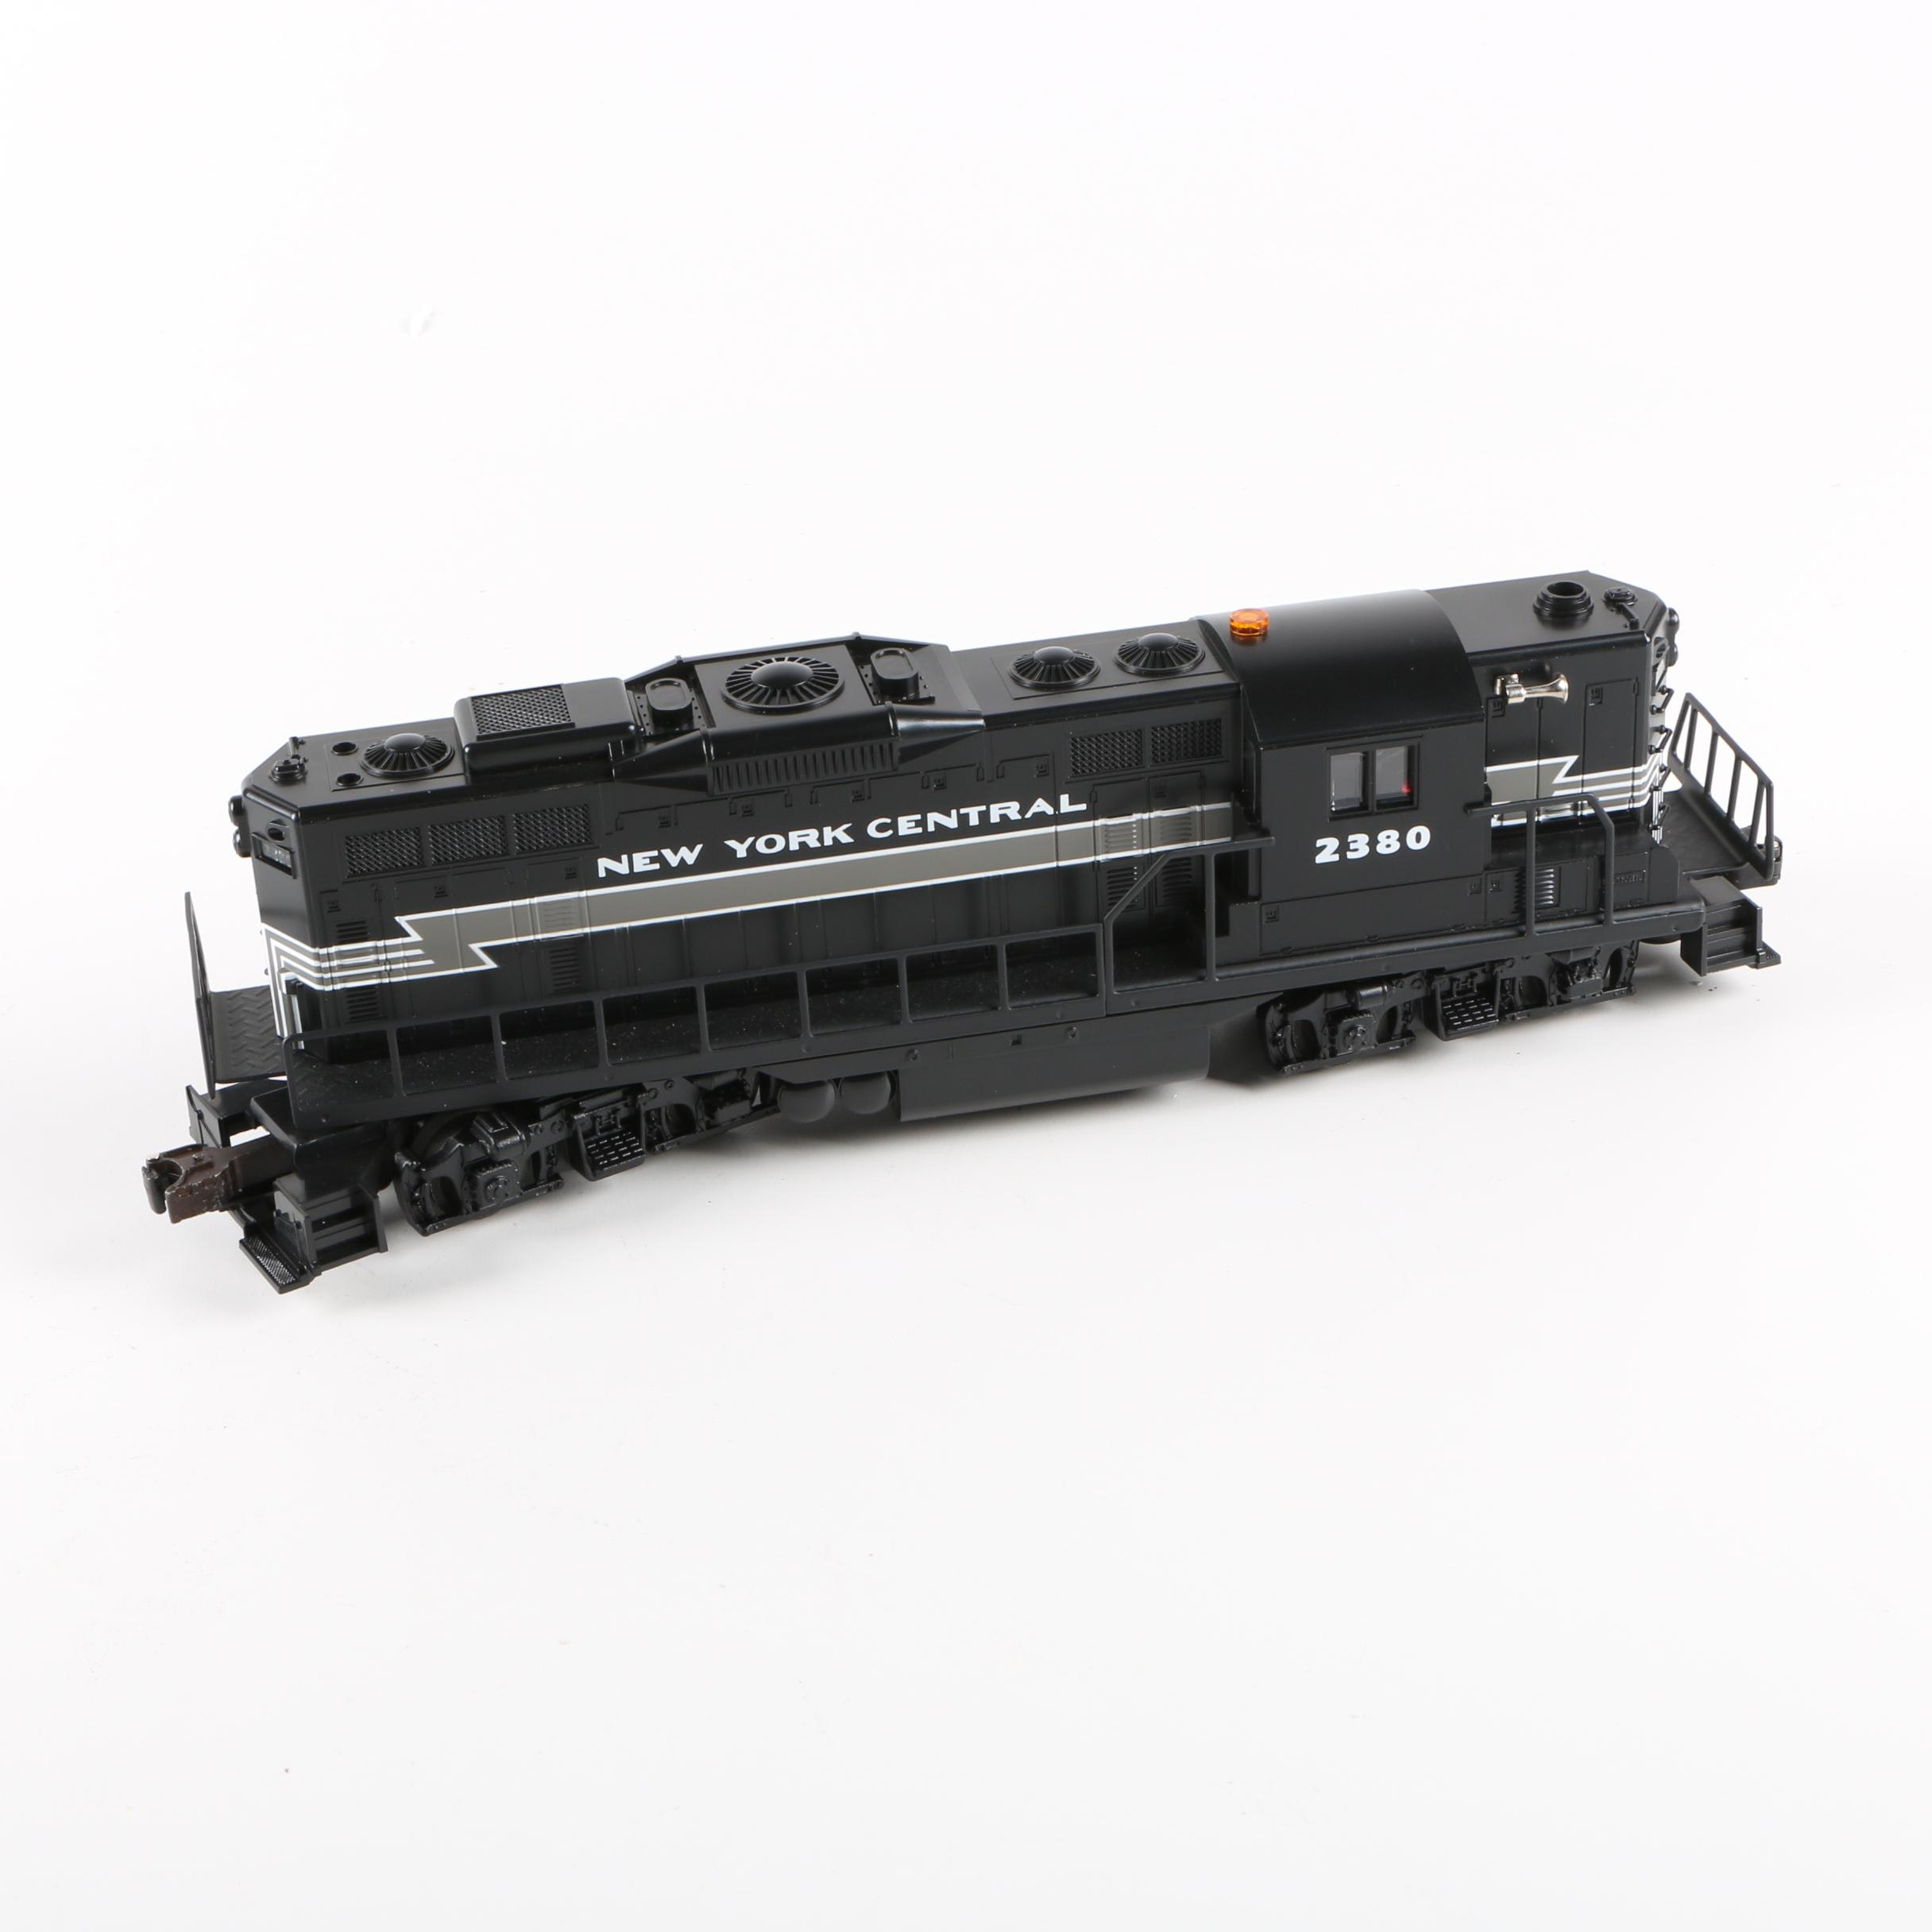 Lionel O Scale New York Central GP-9 Diesel Engine